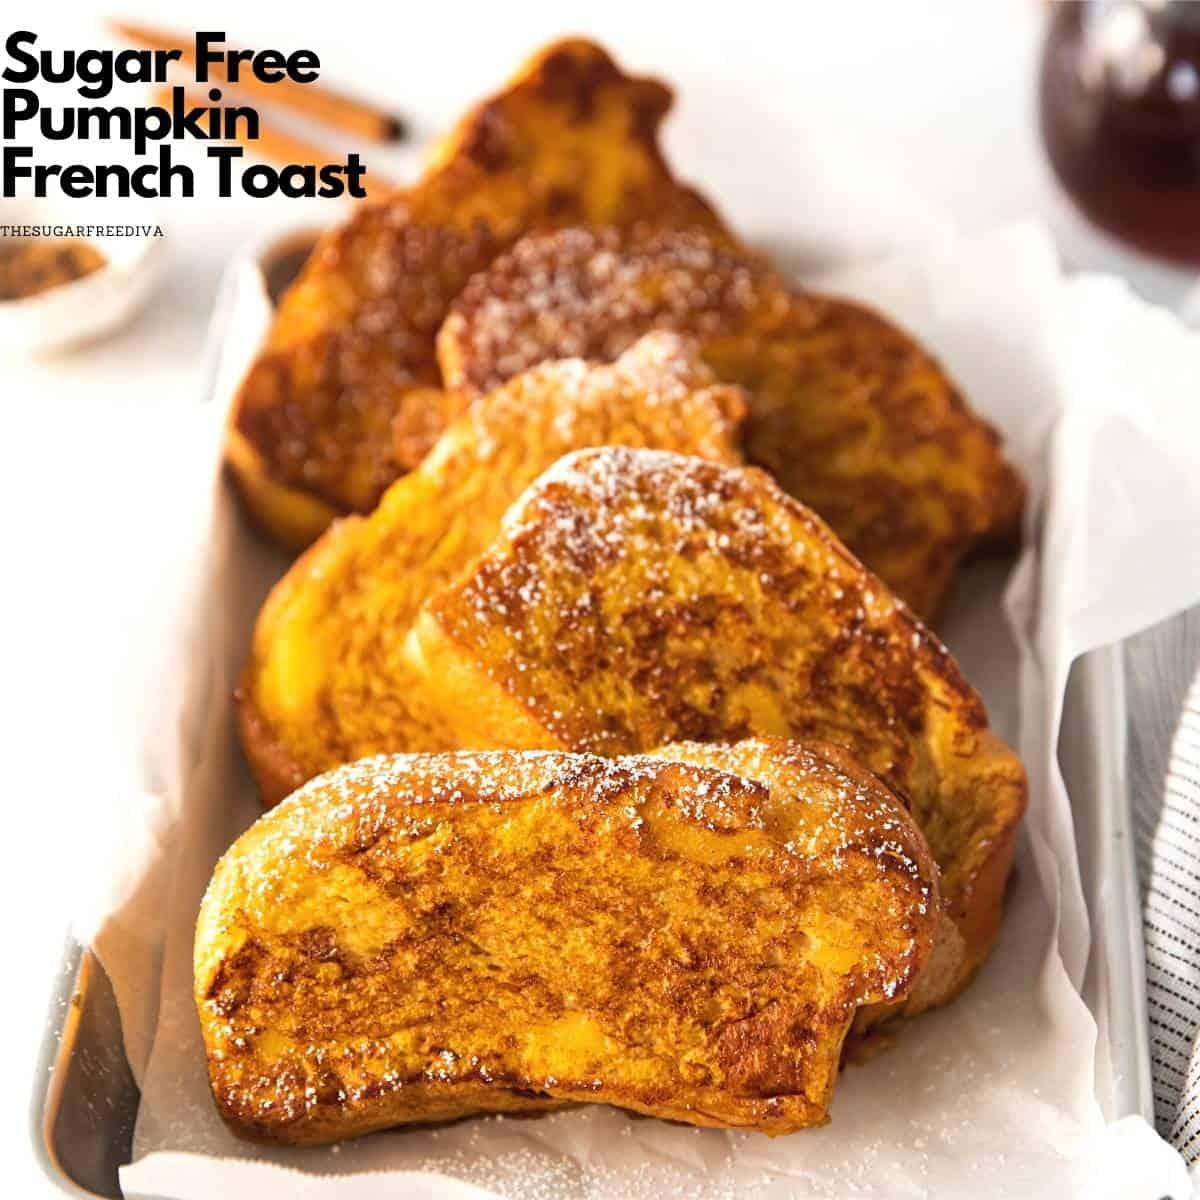 Sugar Free Pumpkin French Toast